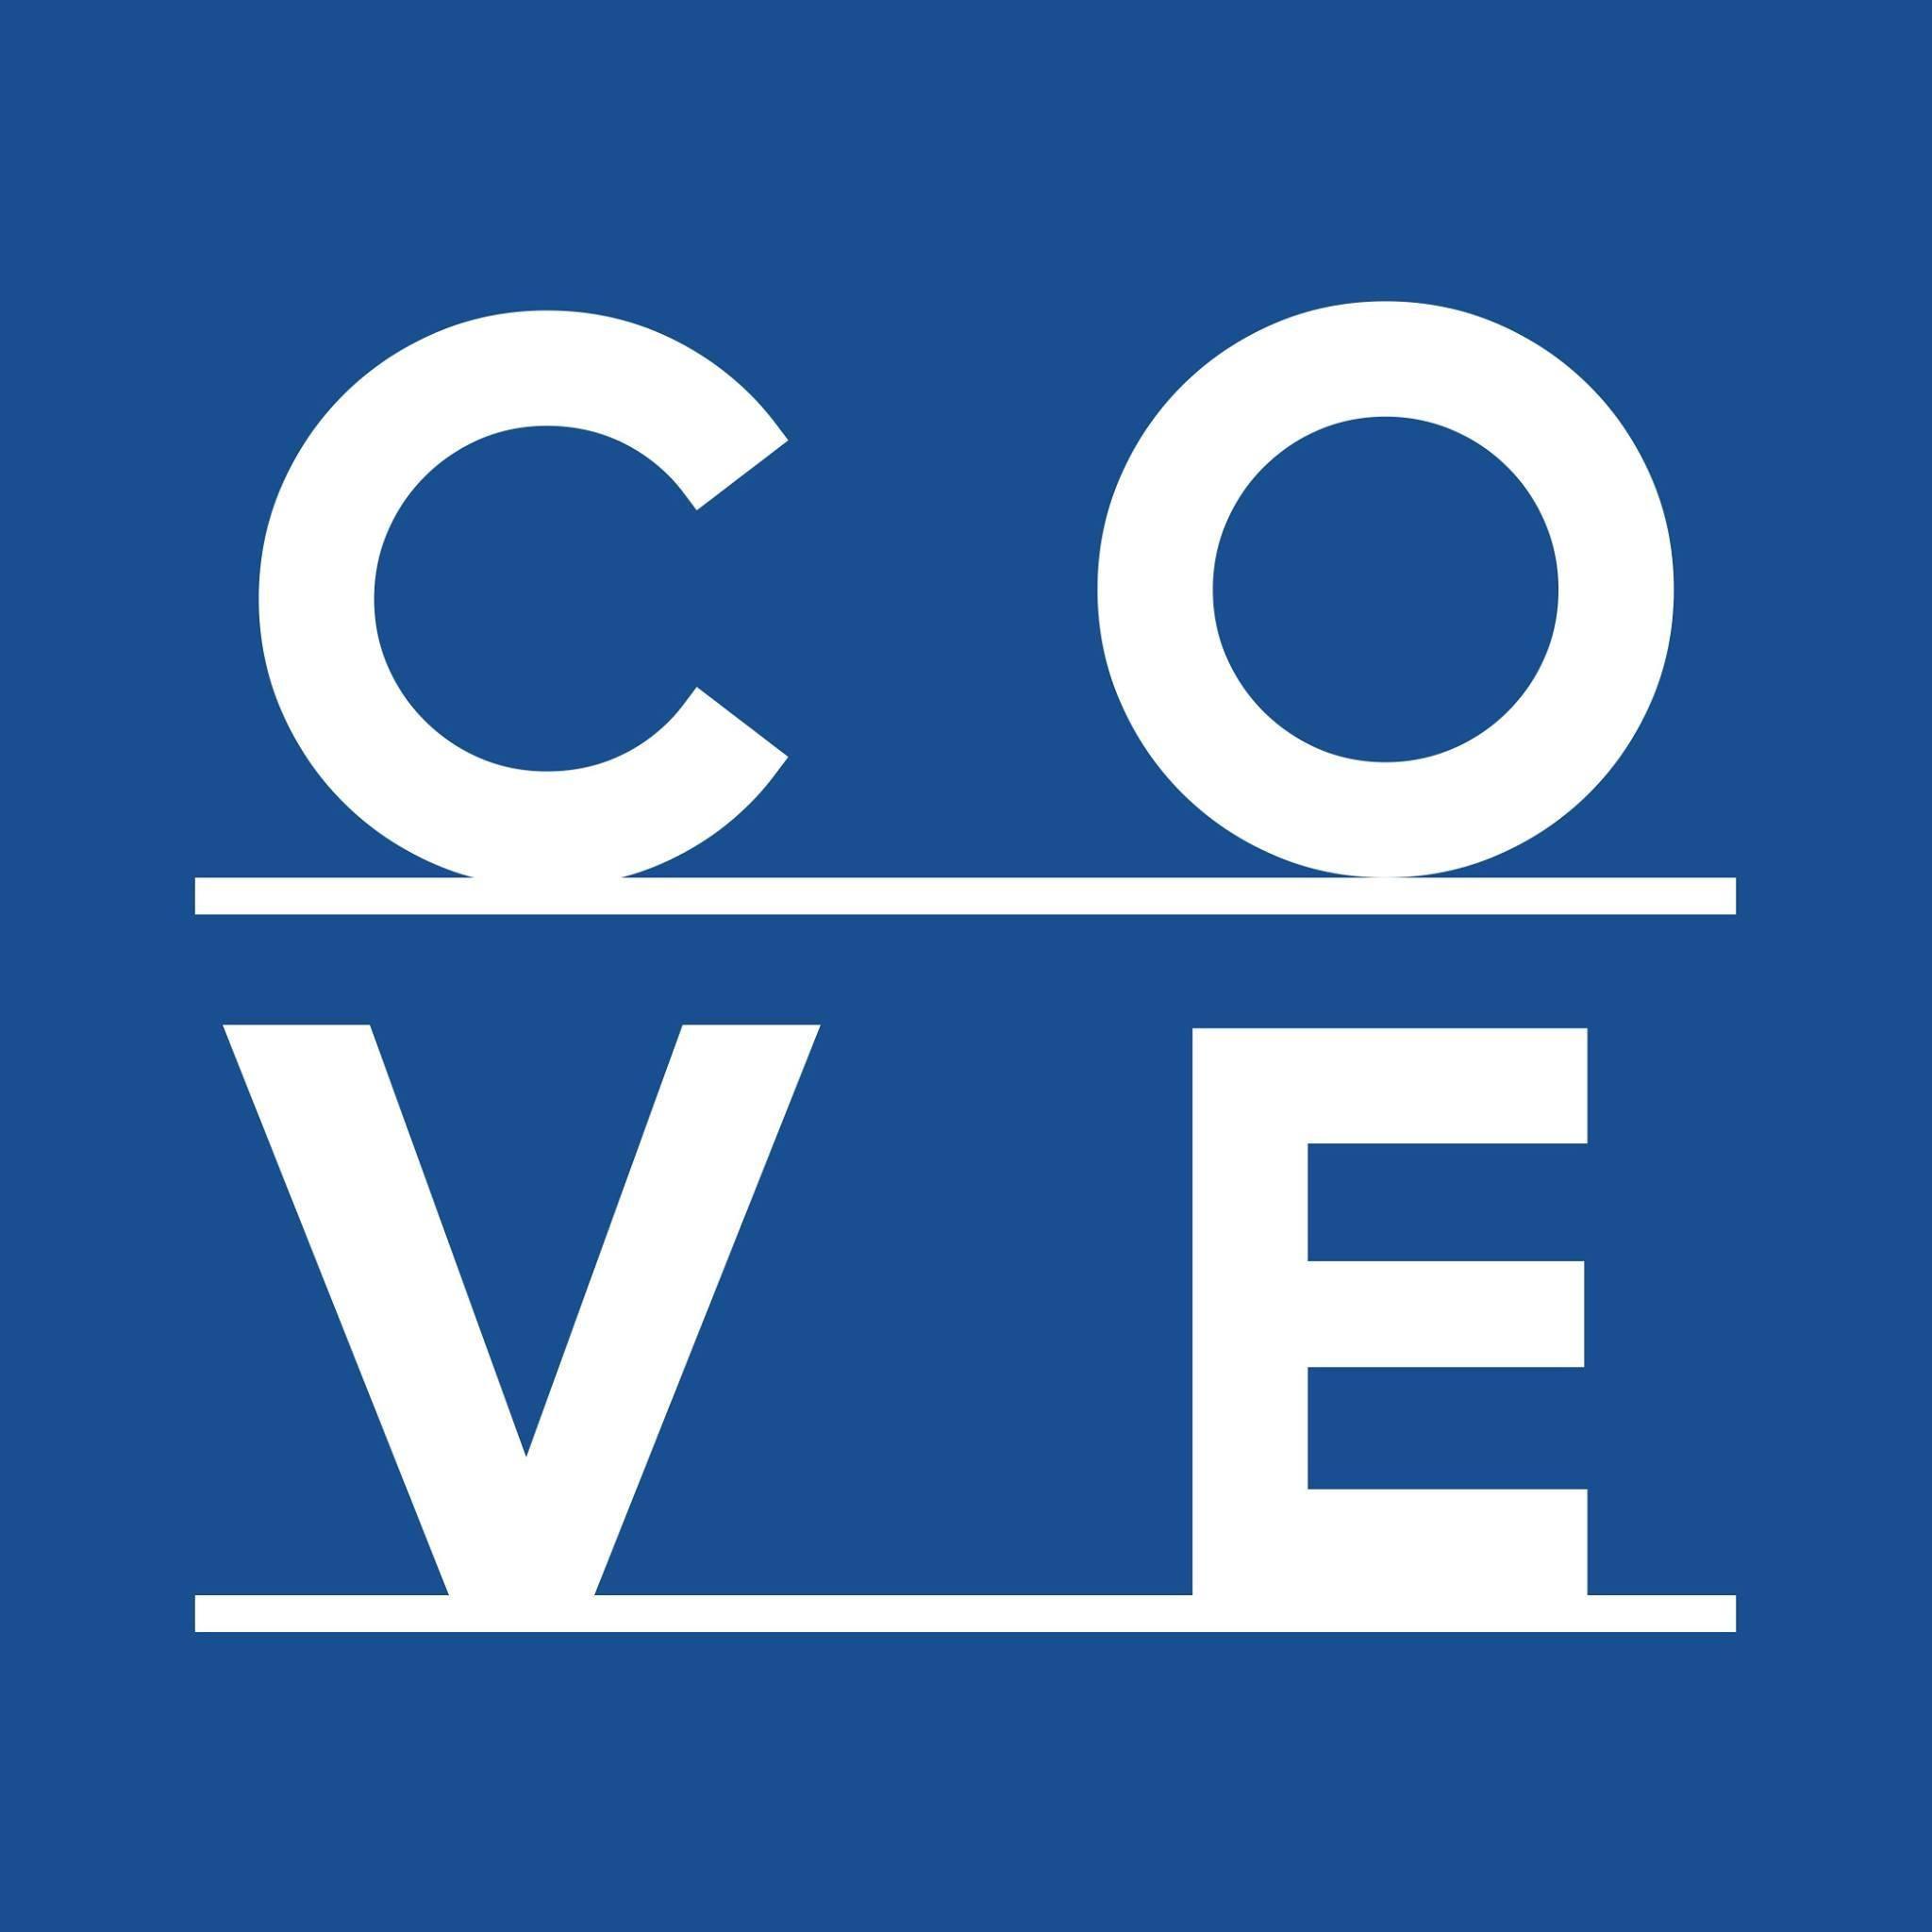 Cove Coliving Company